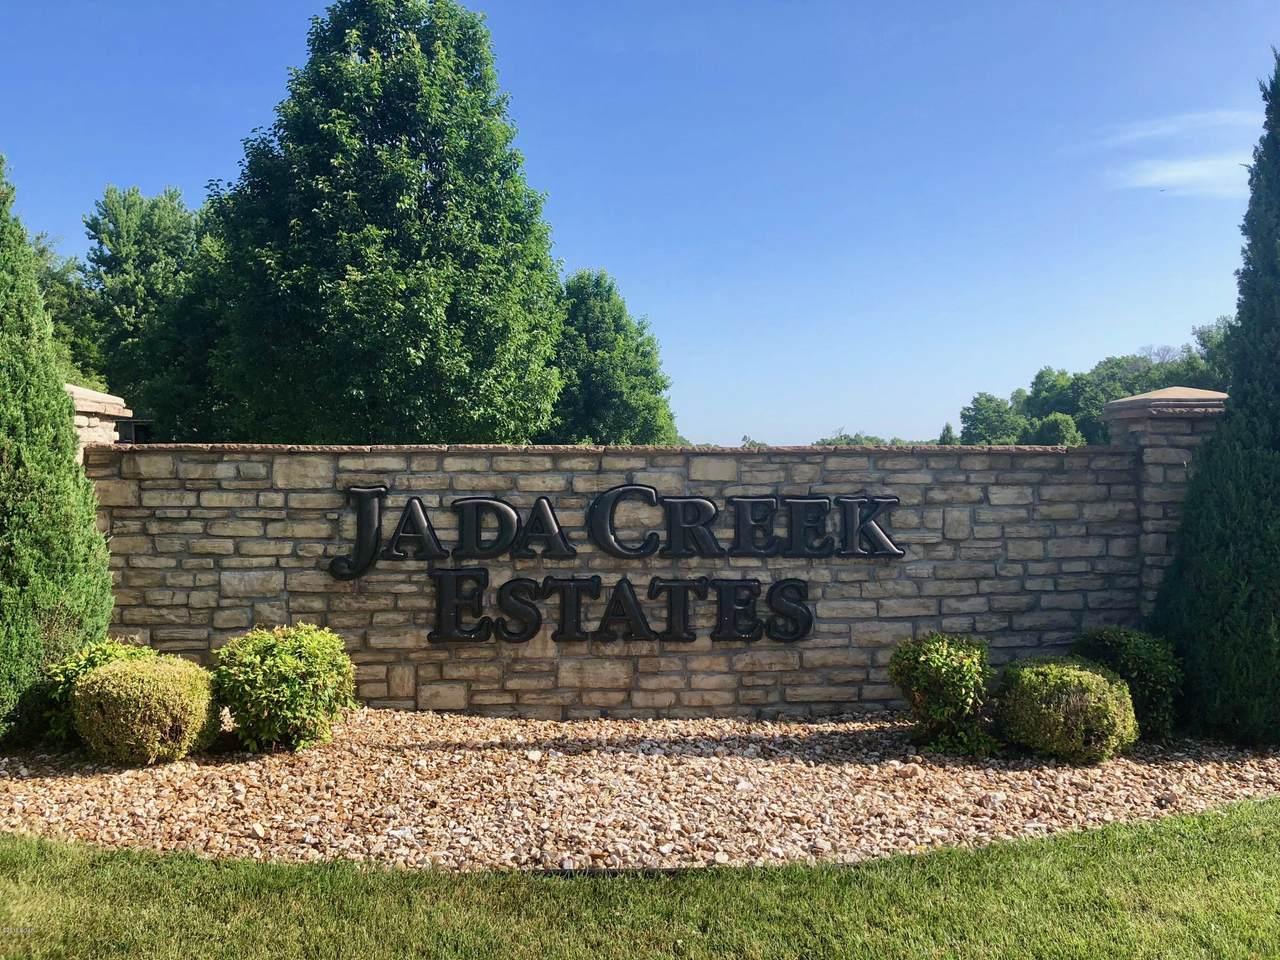 Lot 11 Jada Creek Estates - Photo 1